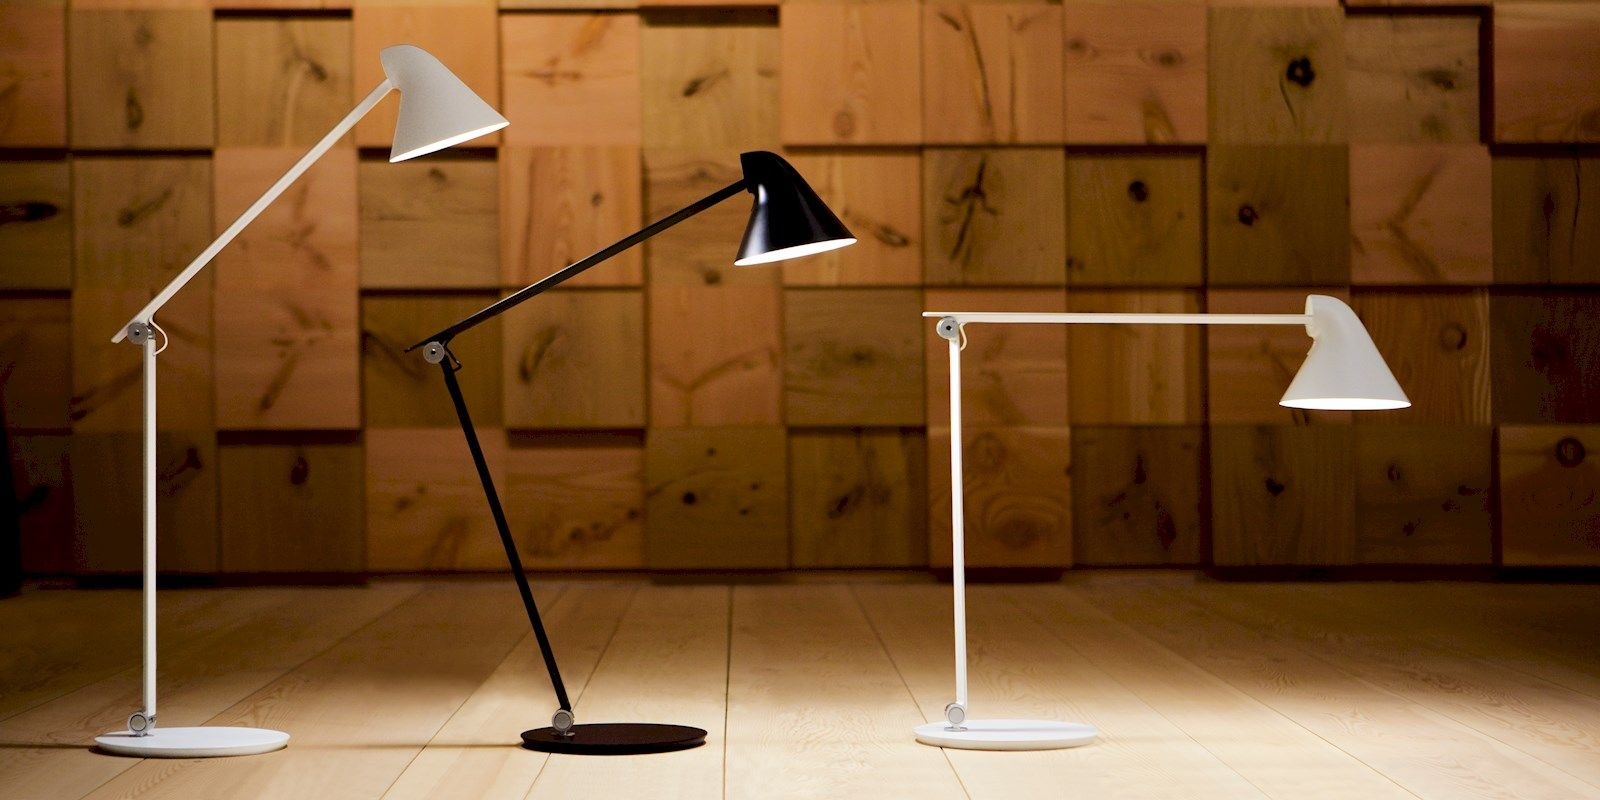 Louis Poulsen Is An International Lighting Manufacturer And Part Of Polaris Private Equity Louis Poulsen Targets Lampe Design Lampes De Table Lampe Architecte